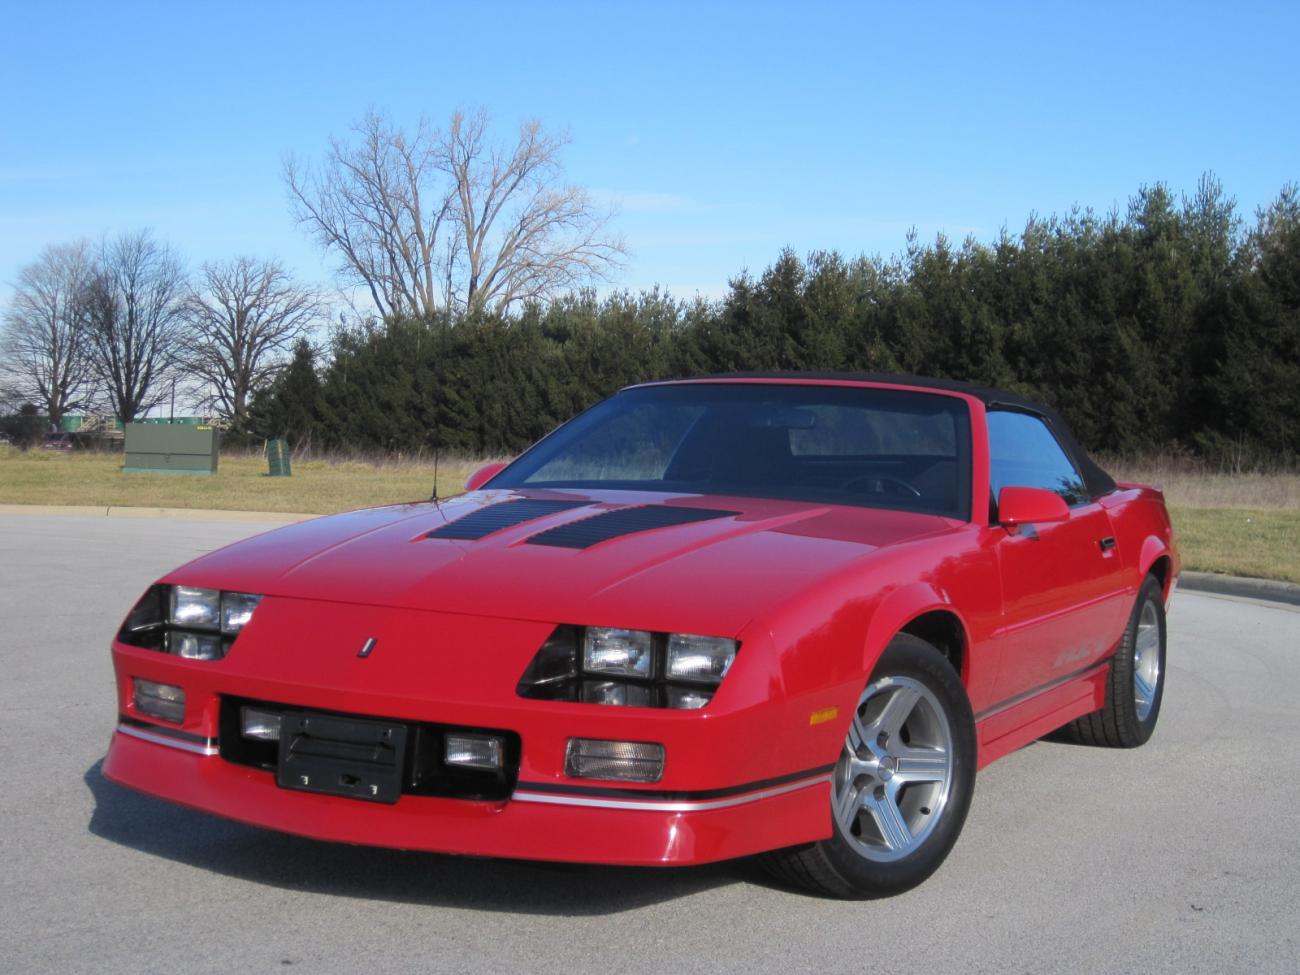 For Sale 1990 Iroc Z Convertible 13k Miles Camaro5 Chevy Camaro Forum Camaro Zl1 Ss And V6